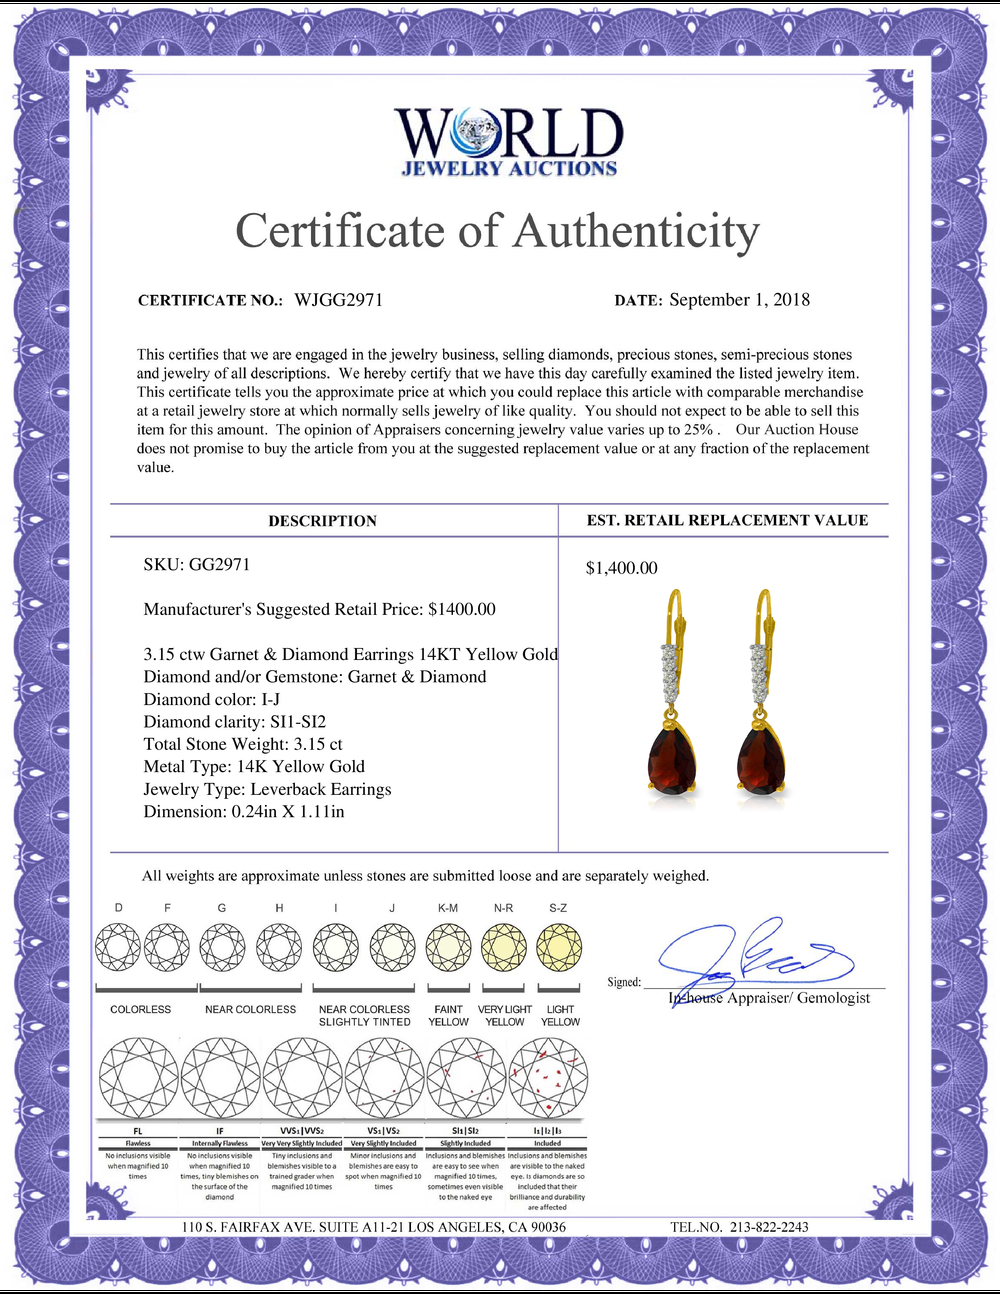 Lot 3073: Genuine 3.15 ctw Garnet & Diamond Earrings Jewelry 14KT Yellow Gold - REF-44H3X